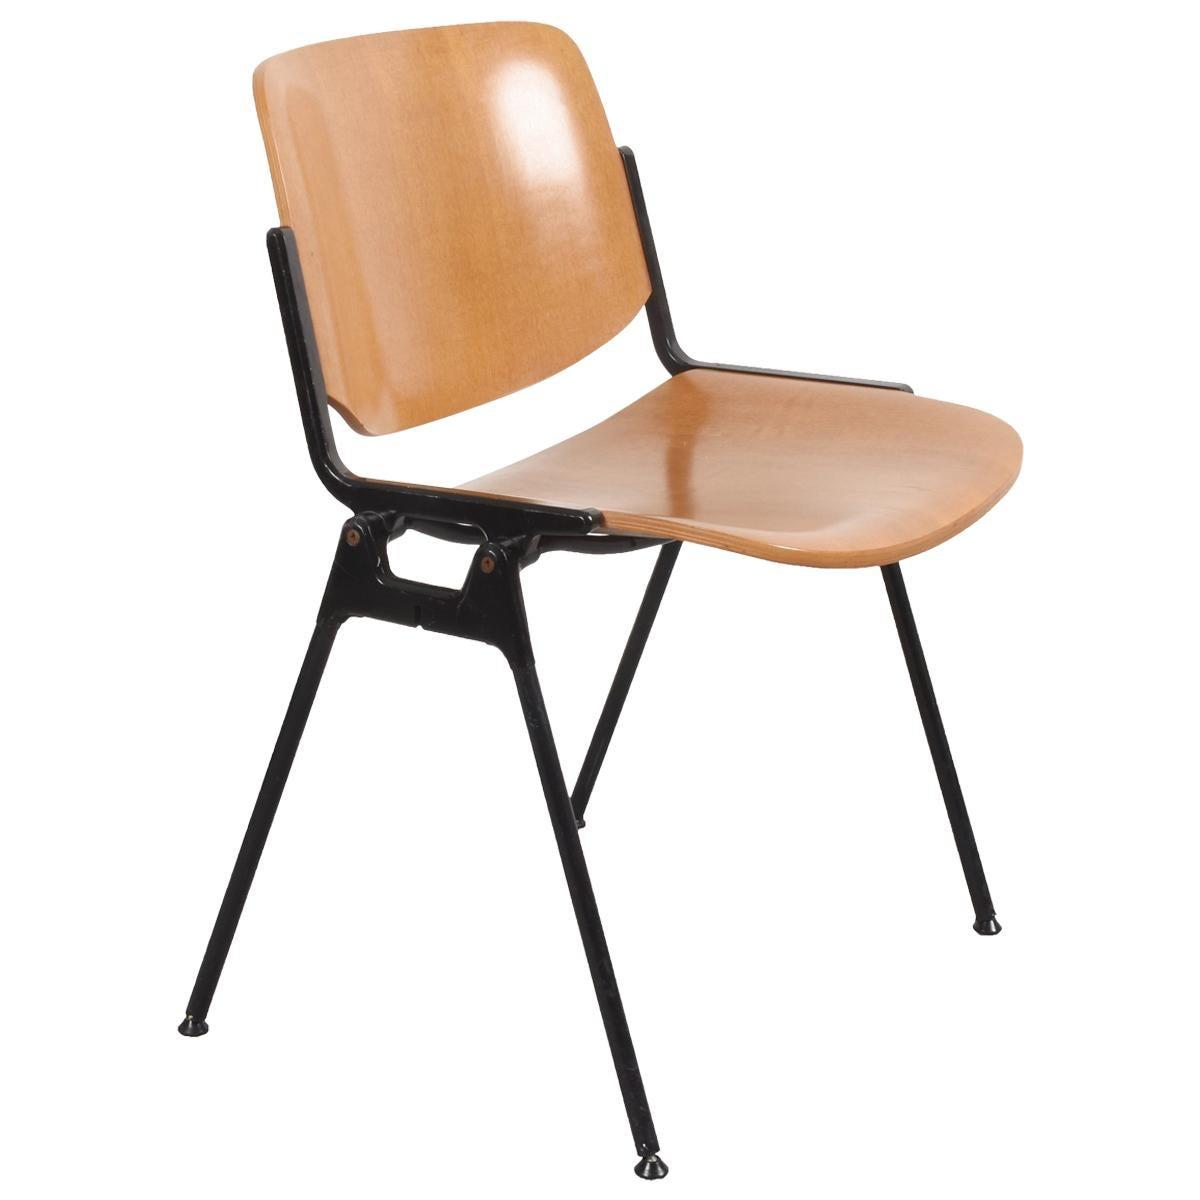 Italian Chair DSC 106 Giancarlo Piretti for Castelli Wood Aluminum, Italy, 1960s